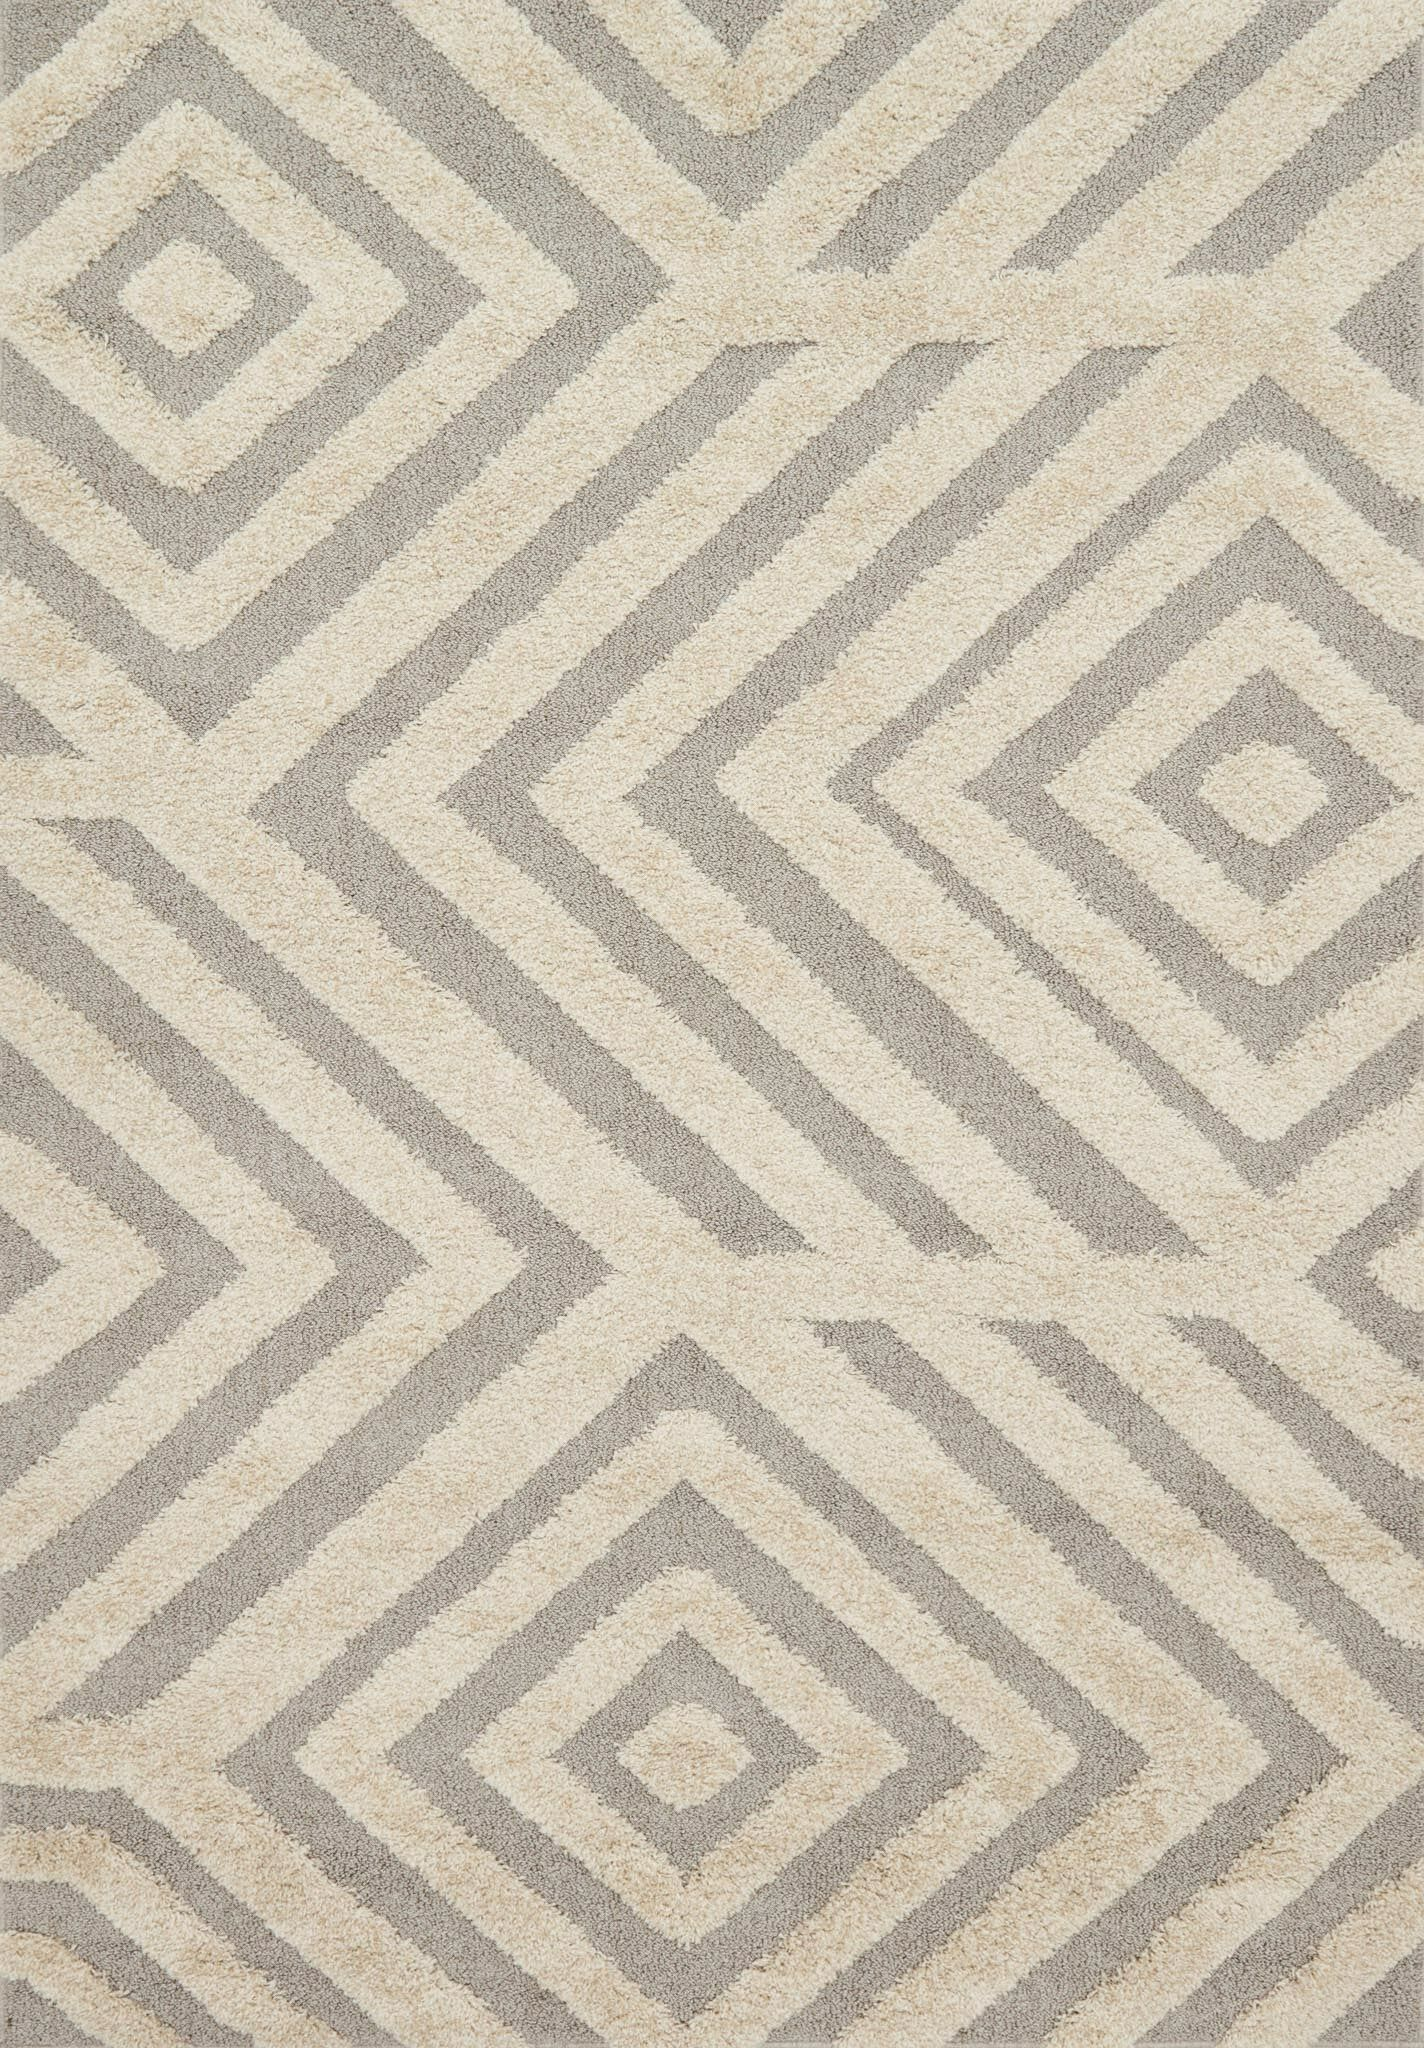 Bigham Sand/Gray Area Rug Rug Size: Rectangle 5'3